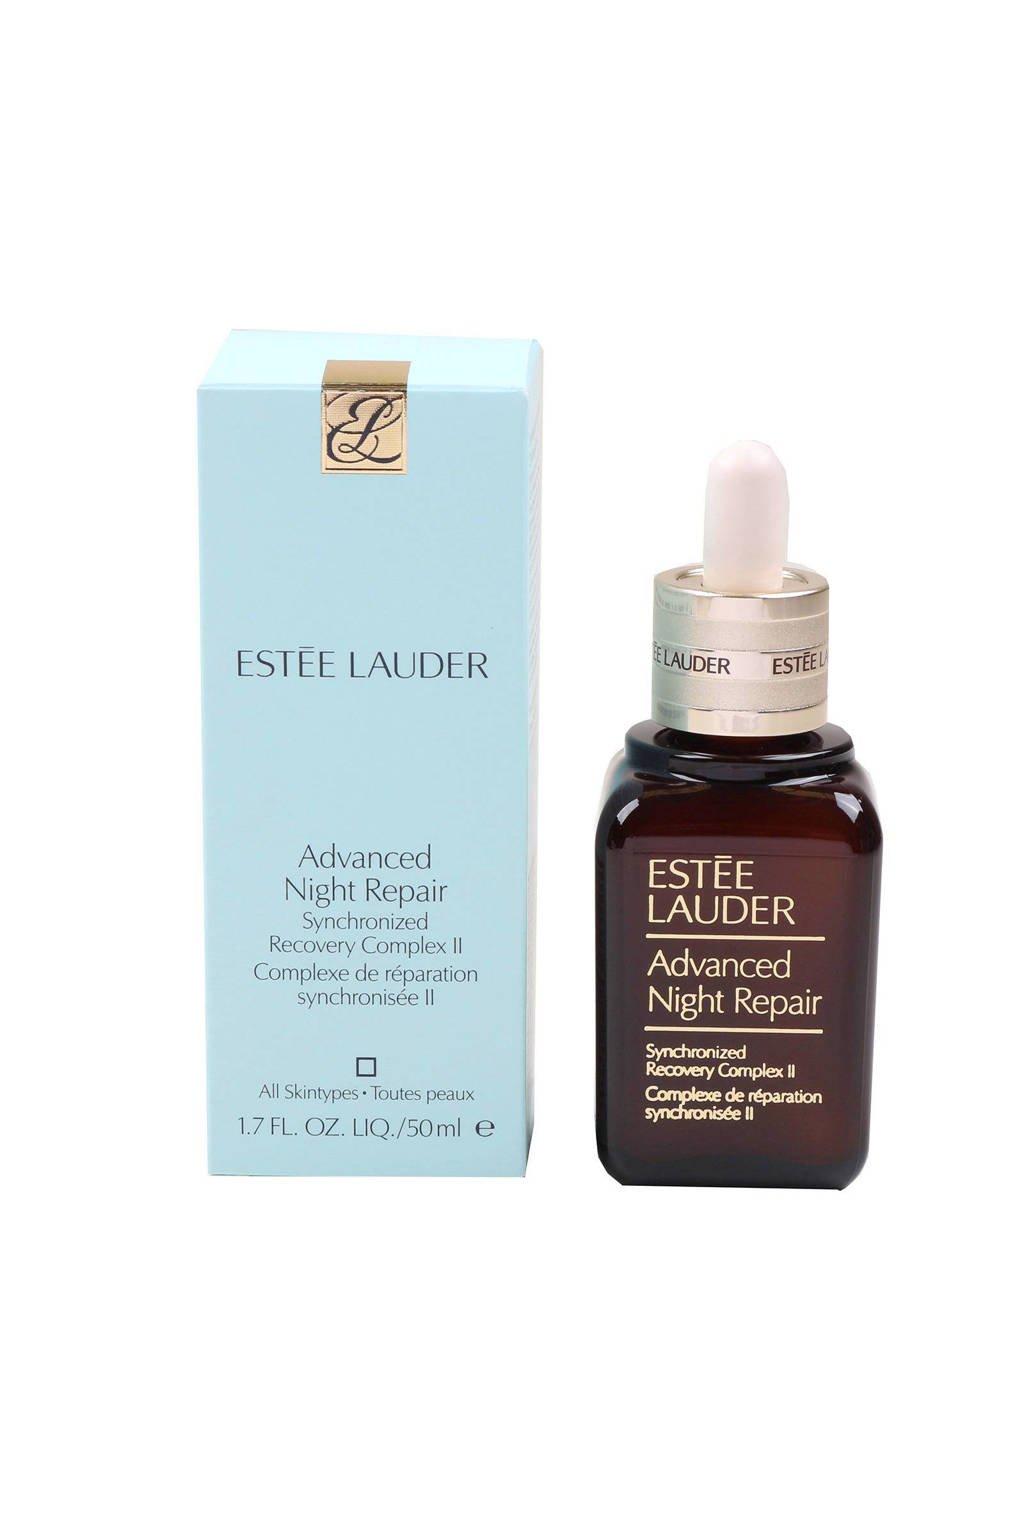 Estee Lauder Advanced Night Repair Synchronized Recovery Complex II serum - 50 ml